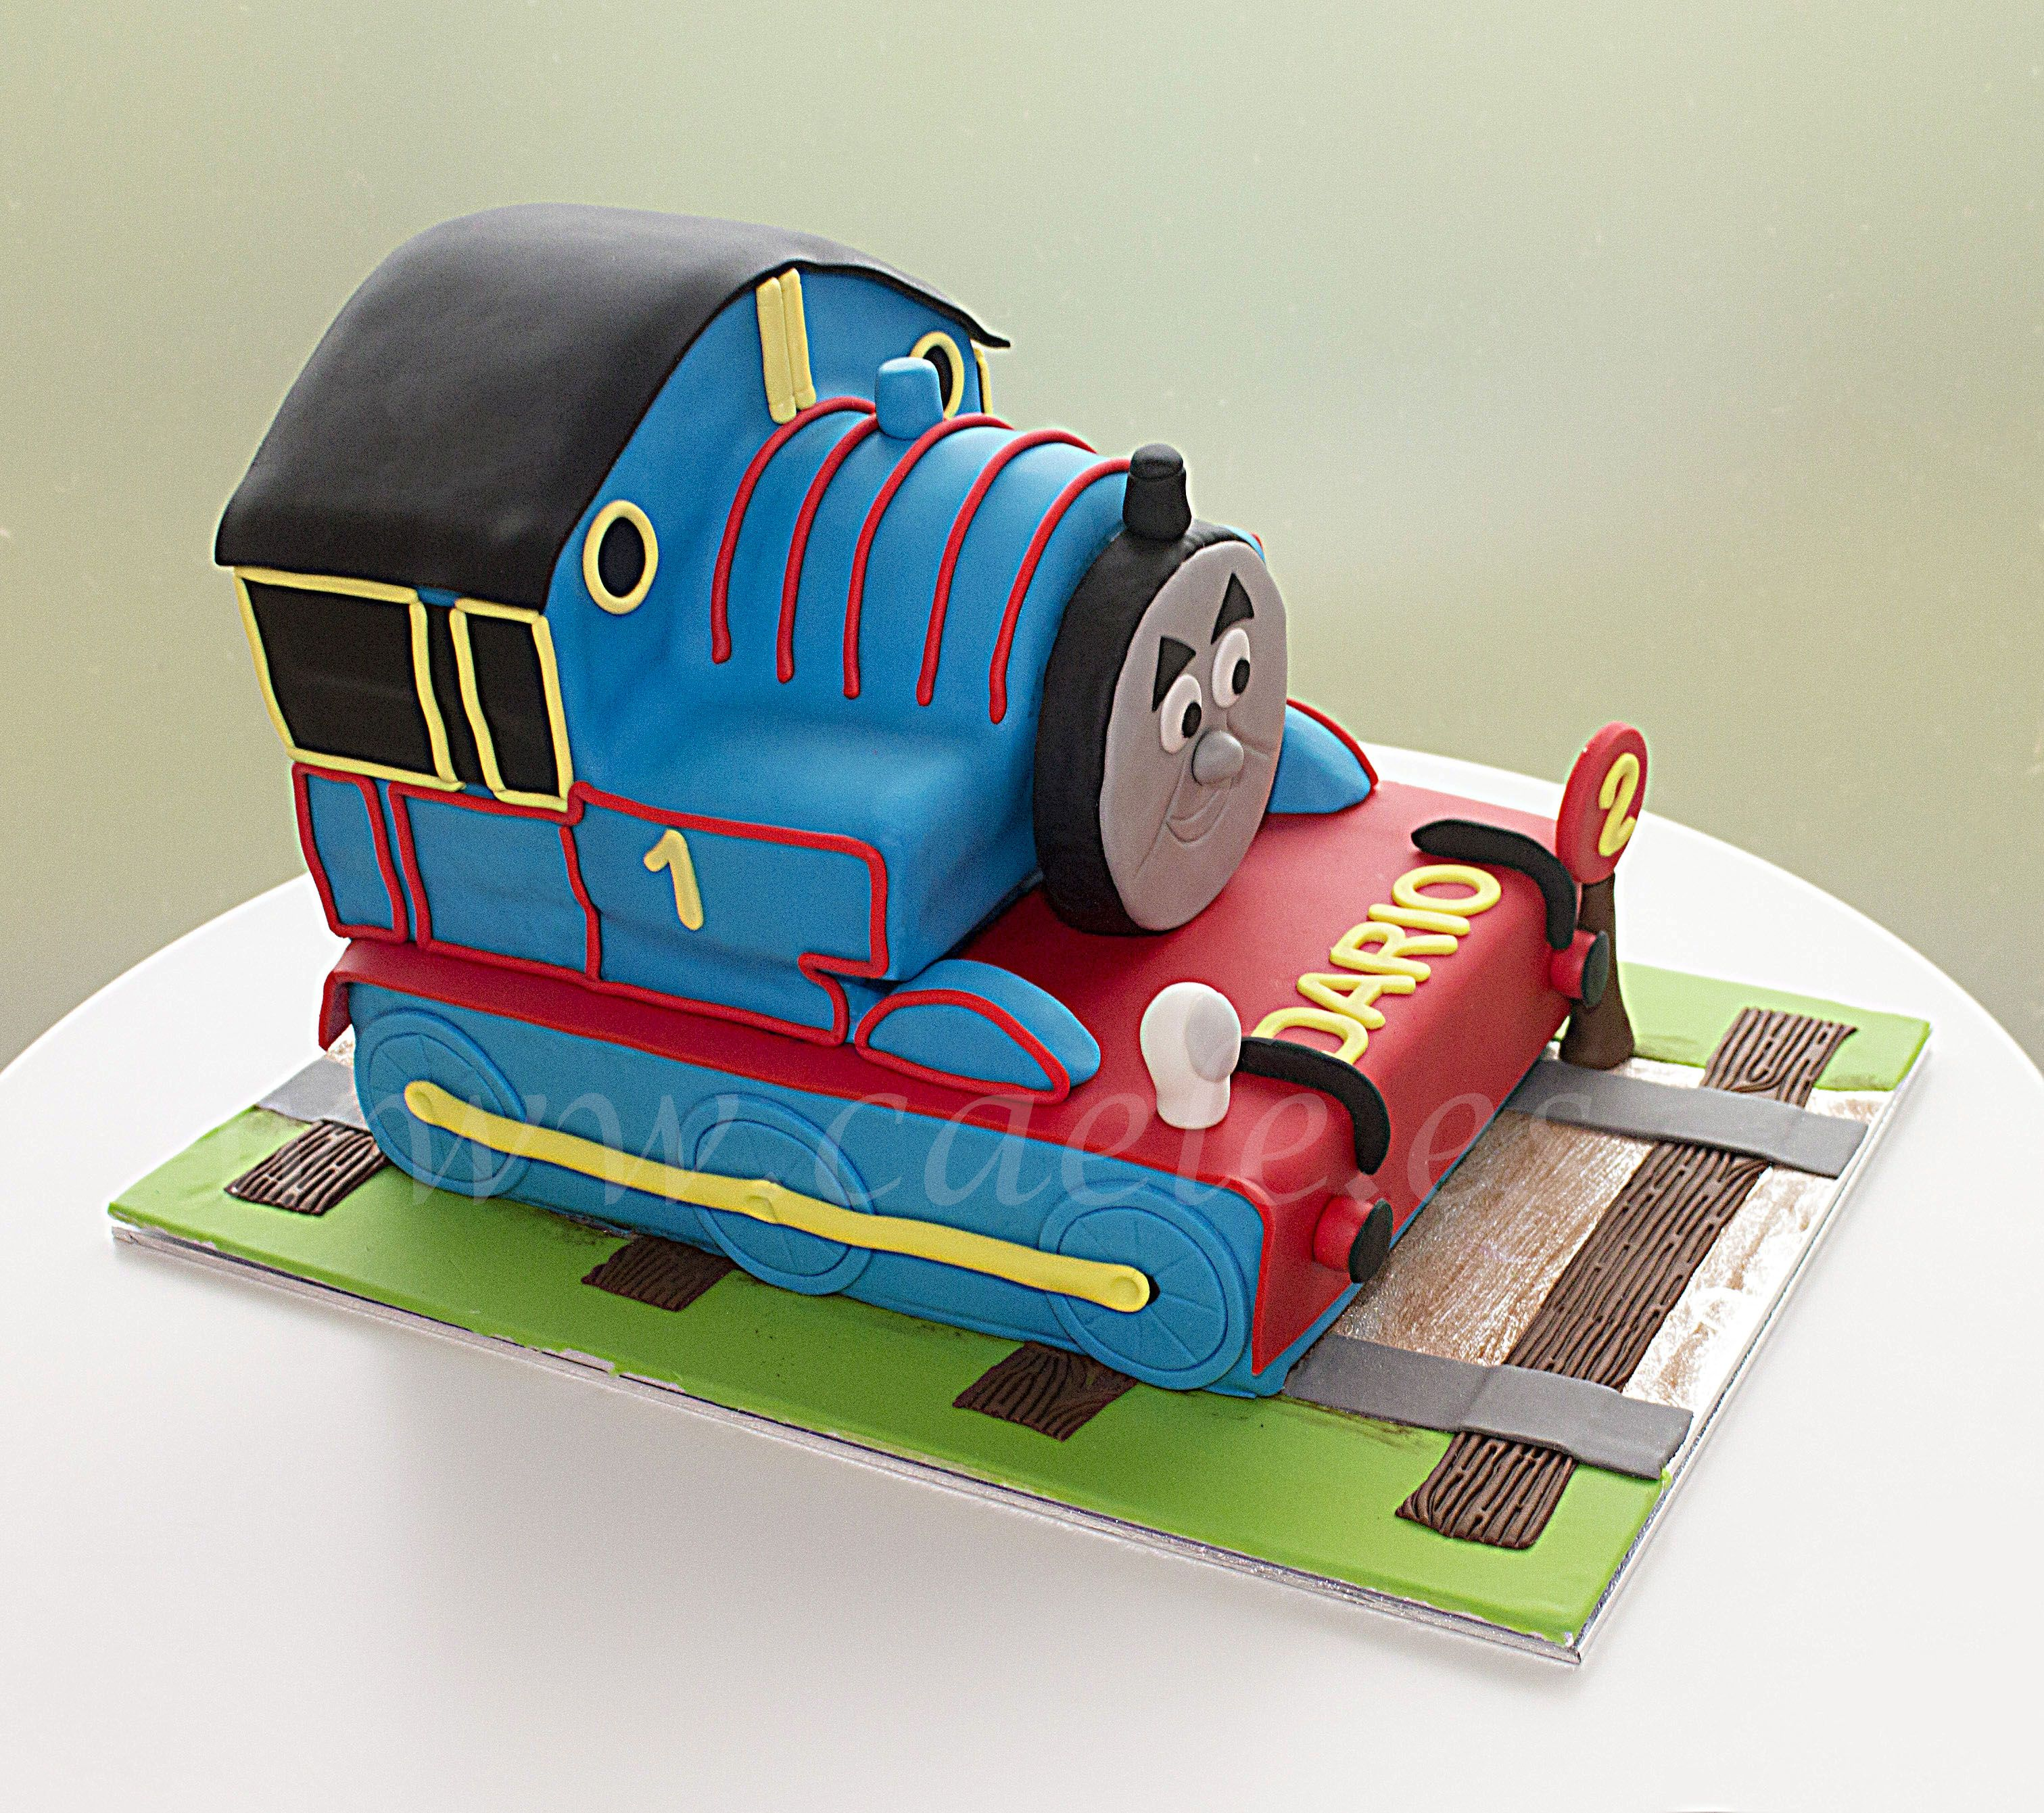 Miniatura Tren Mágico Peliculas El Thomas Wwwmiifotoscom